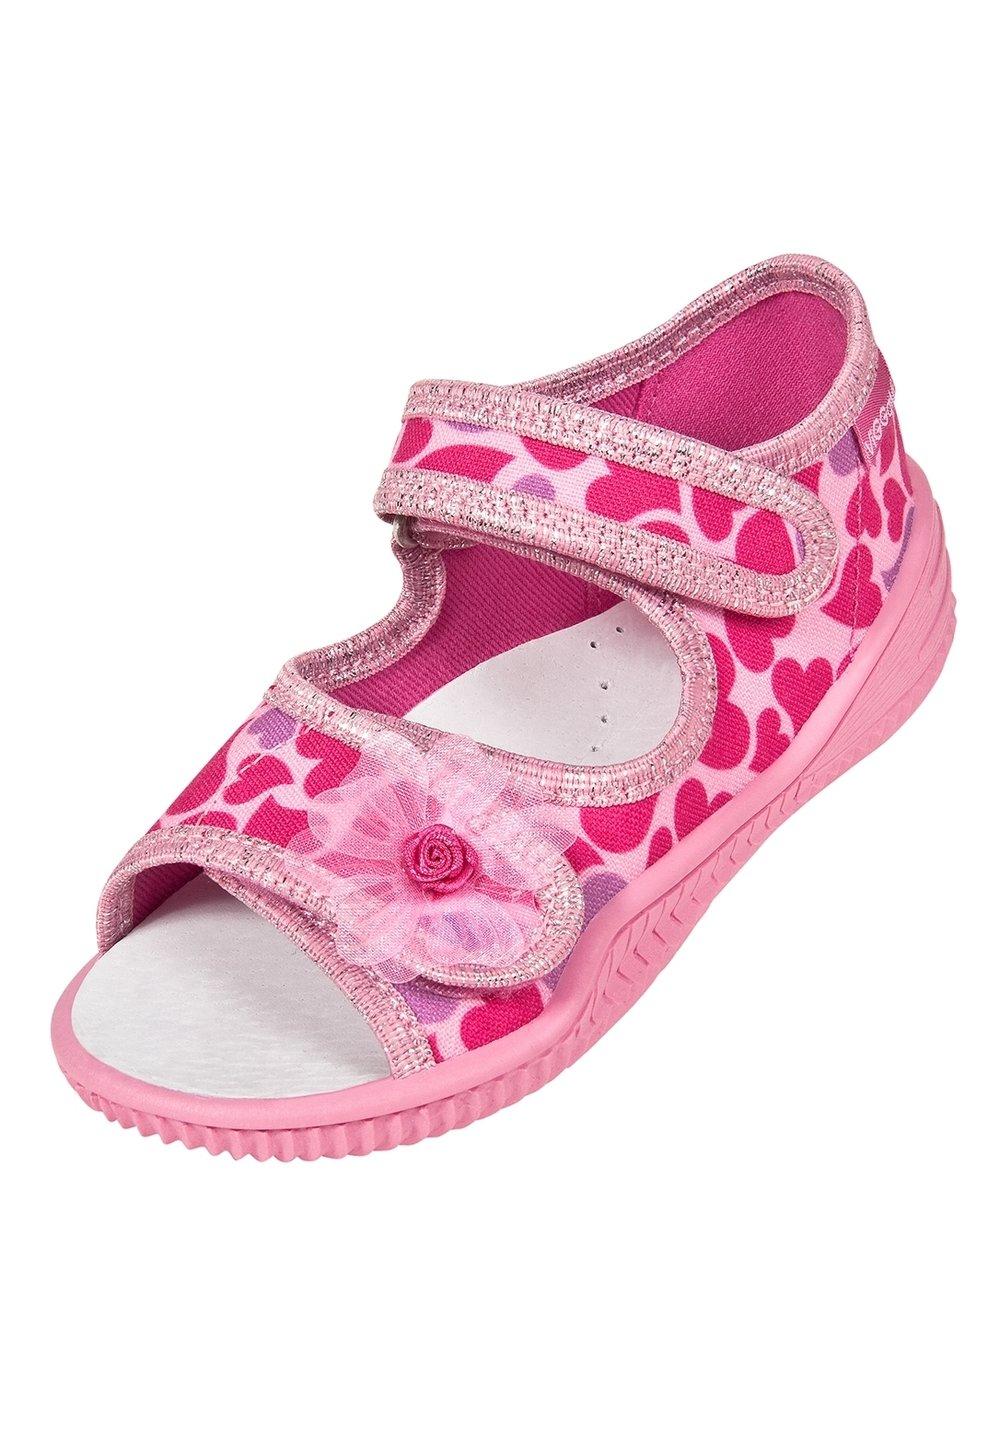 Sandale, roz cu inimioare roz imagine